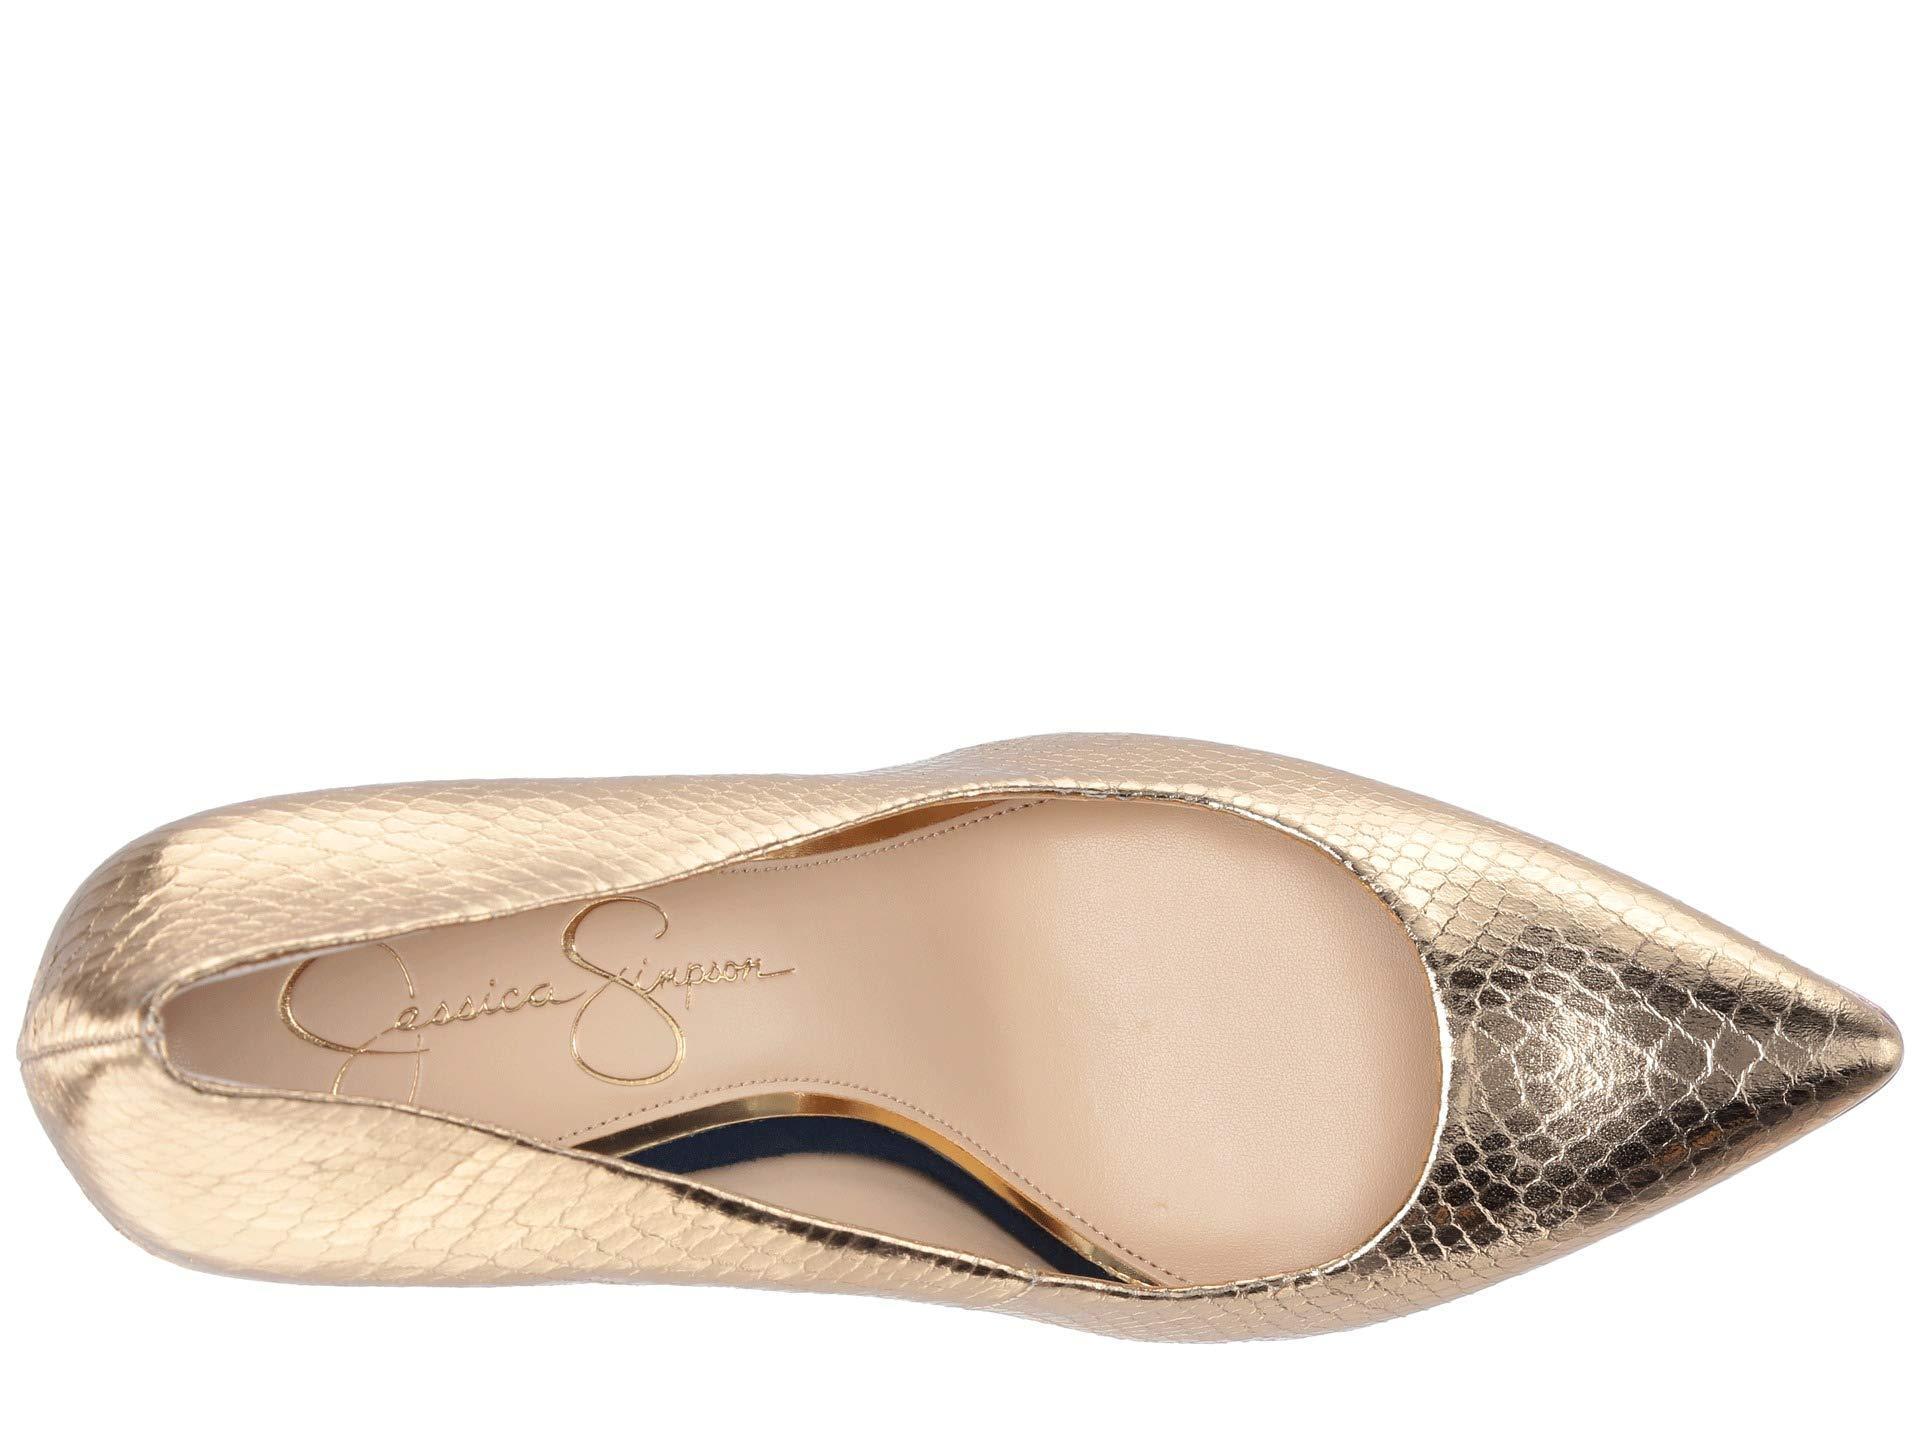 e3db70c93d Jessica Simpson - Loyren (karat Gold Combo Metallic Python) Women's Shoes -  Lyst. View fullscreen